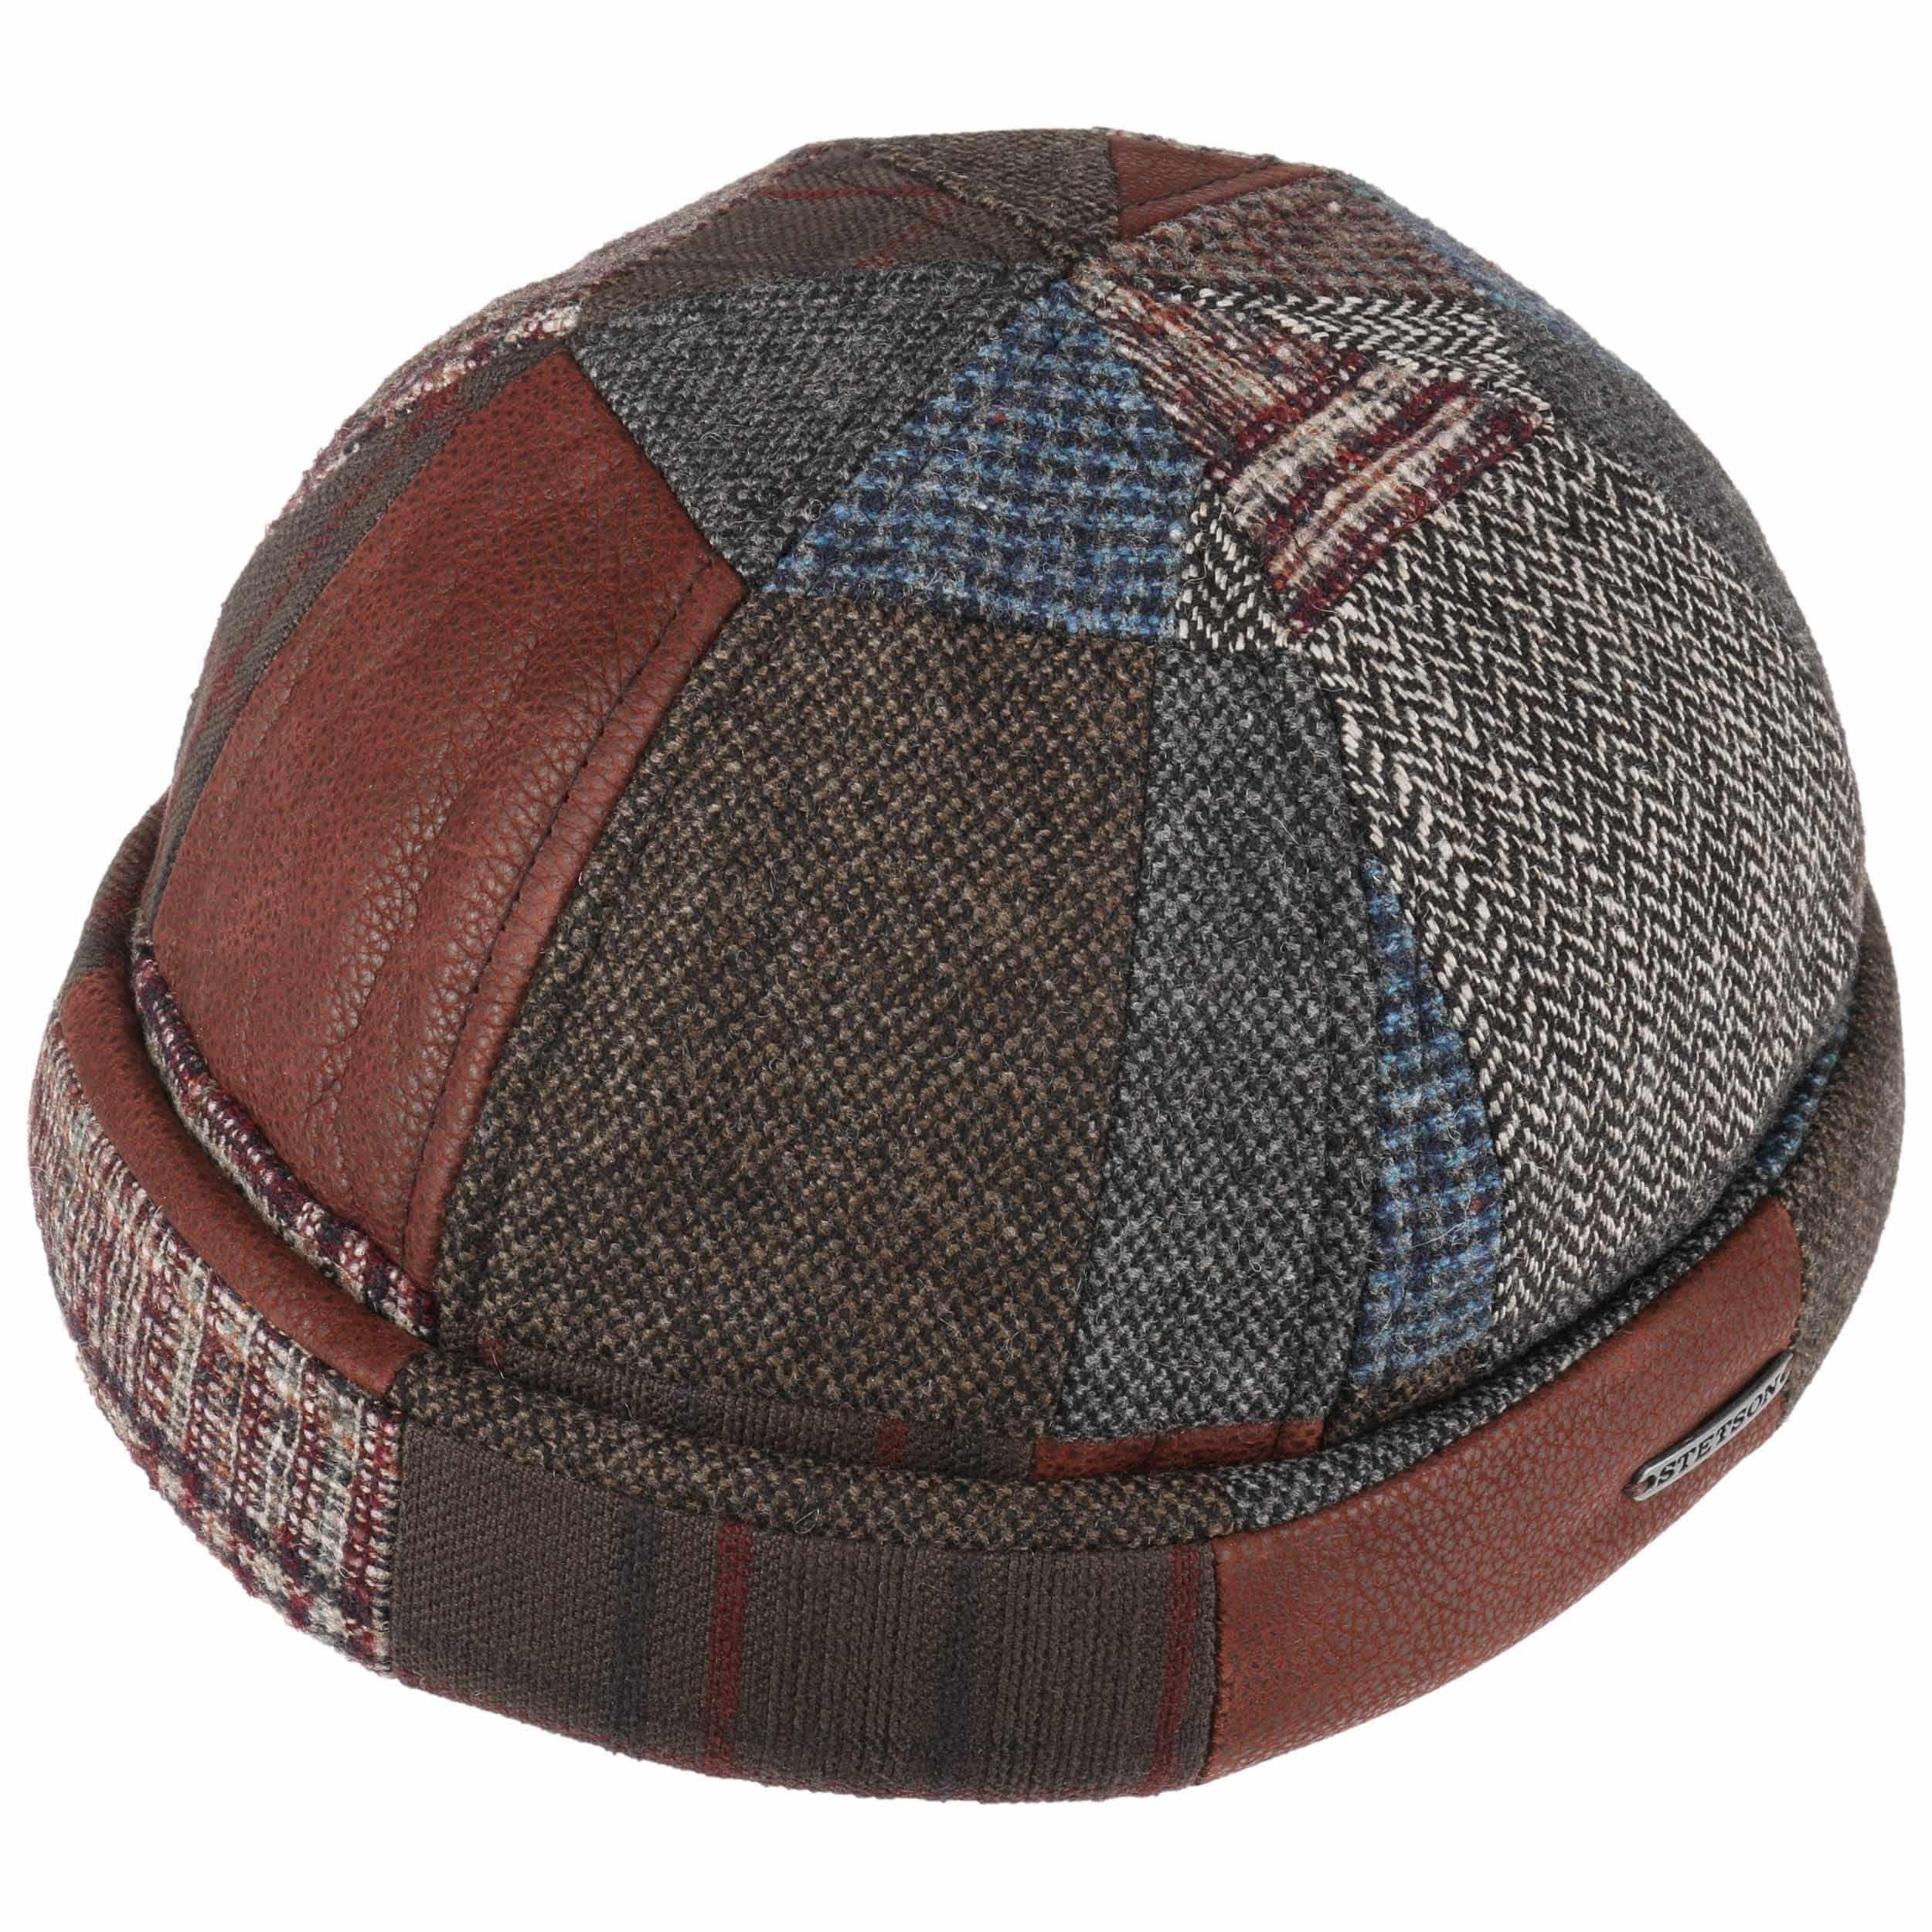 Wool Patchwork Docker Hat brown